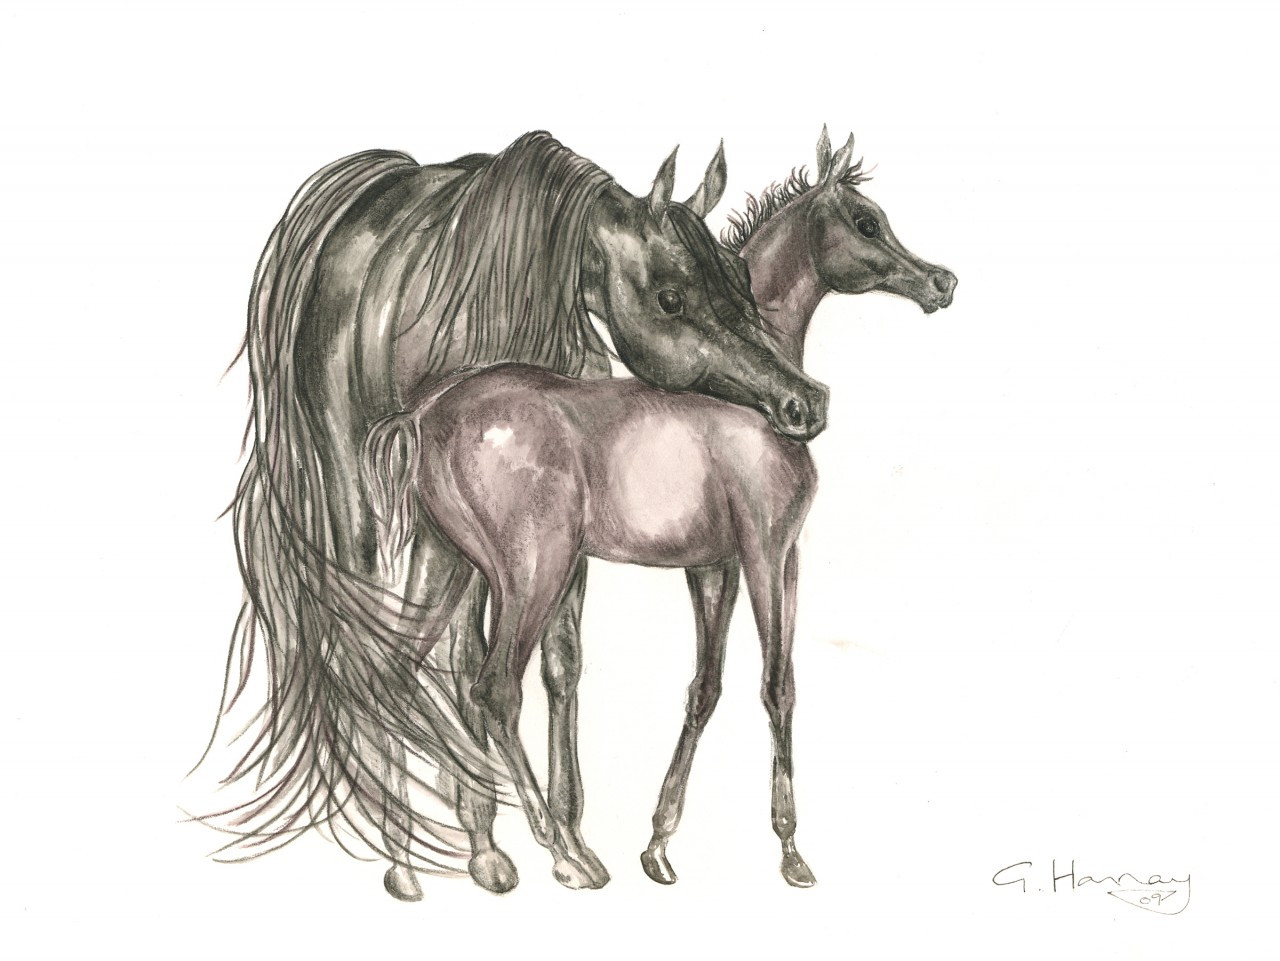 Christmas Horse Drawing.Mare Foal Christmas Card The Arabian Magazine Shop